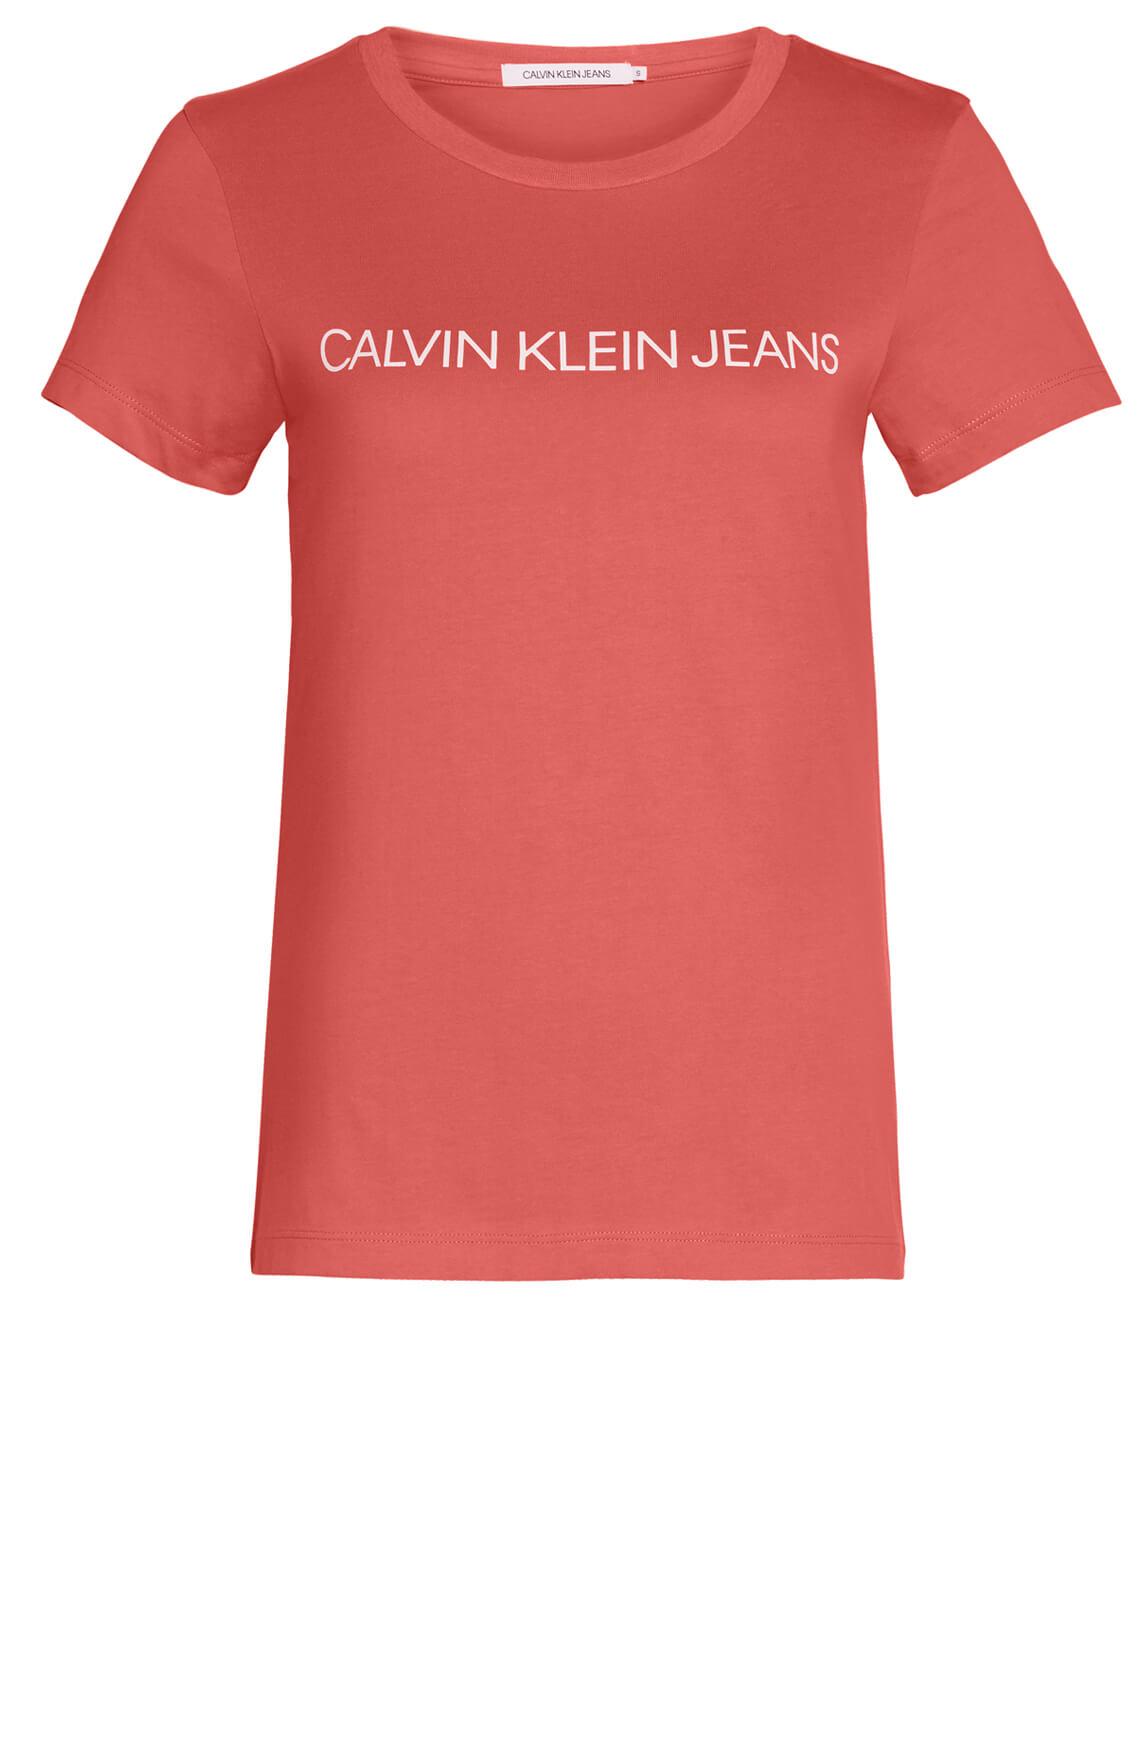 Calvin Klein Dames Shirt met logoprint roze